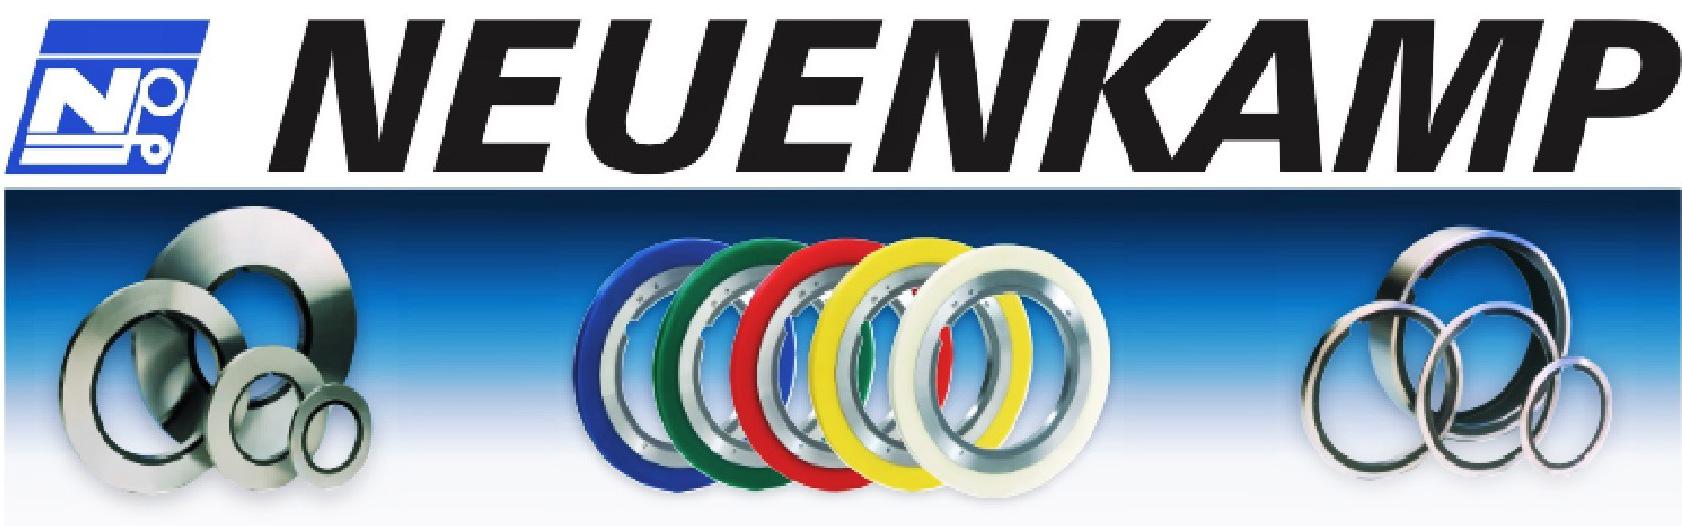 Neuenkamp-Logo-41916new.jpg